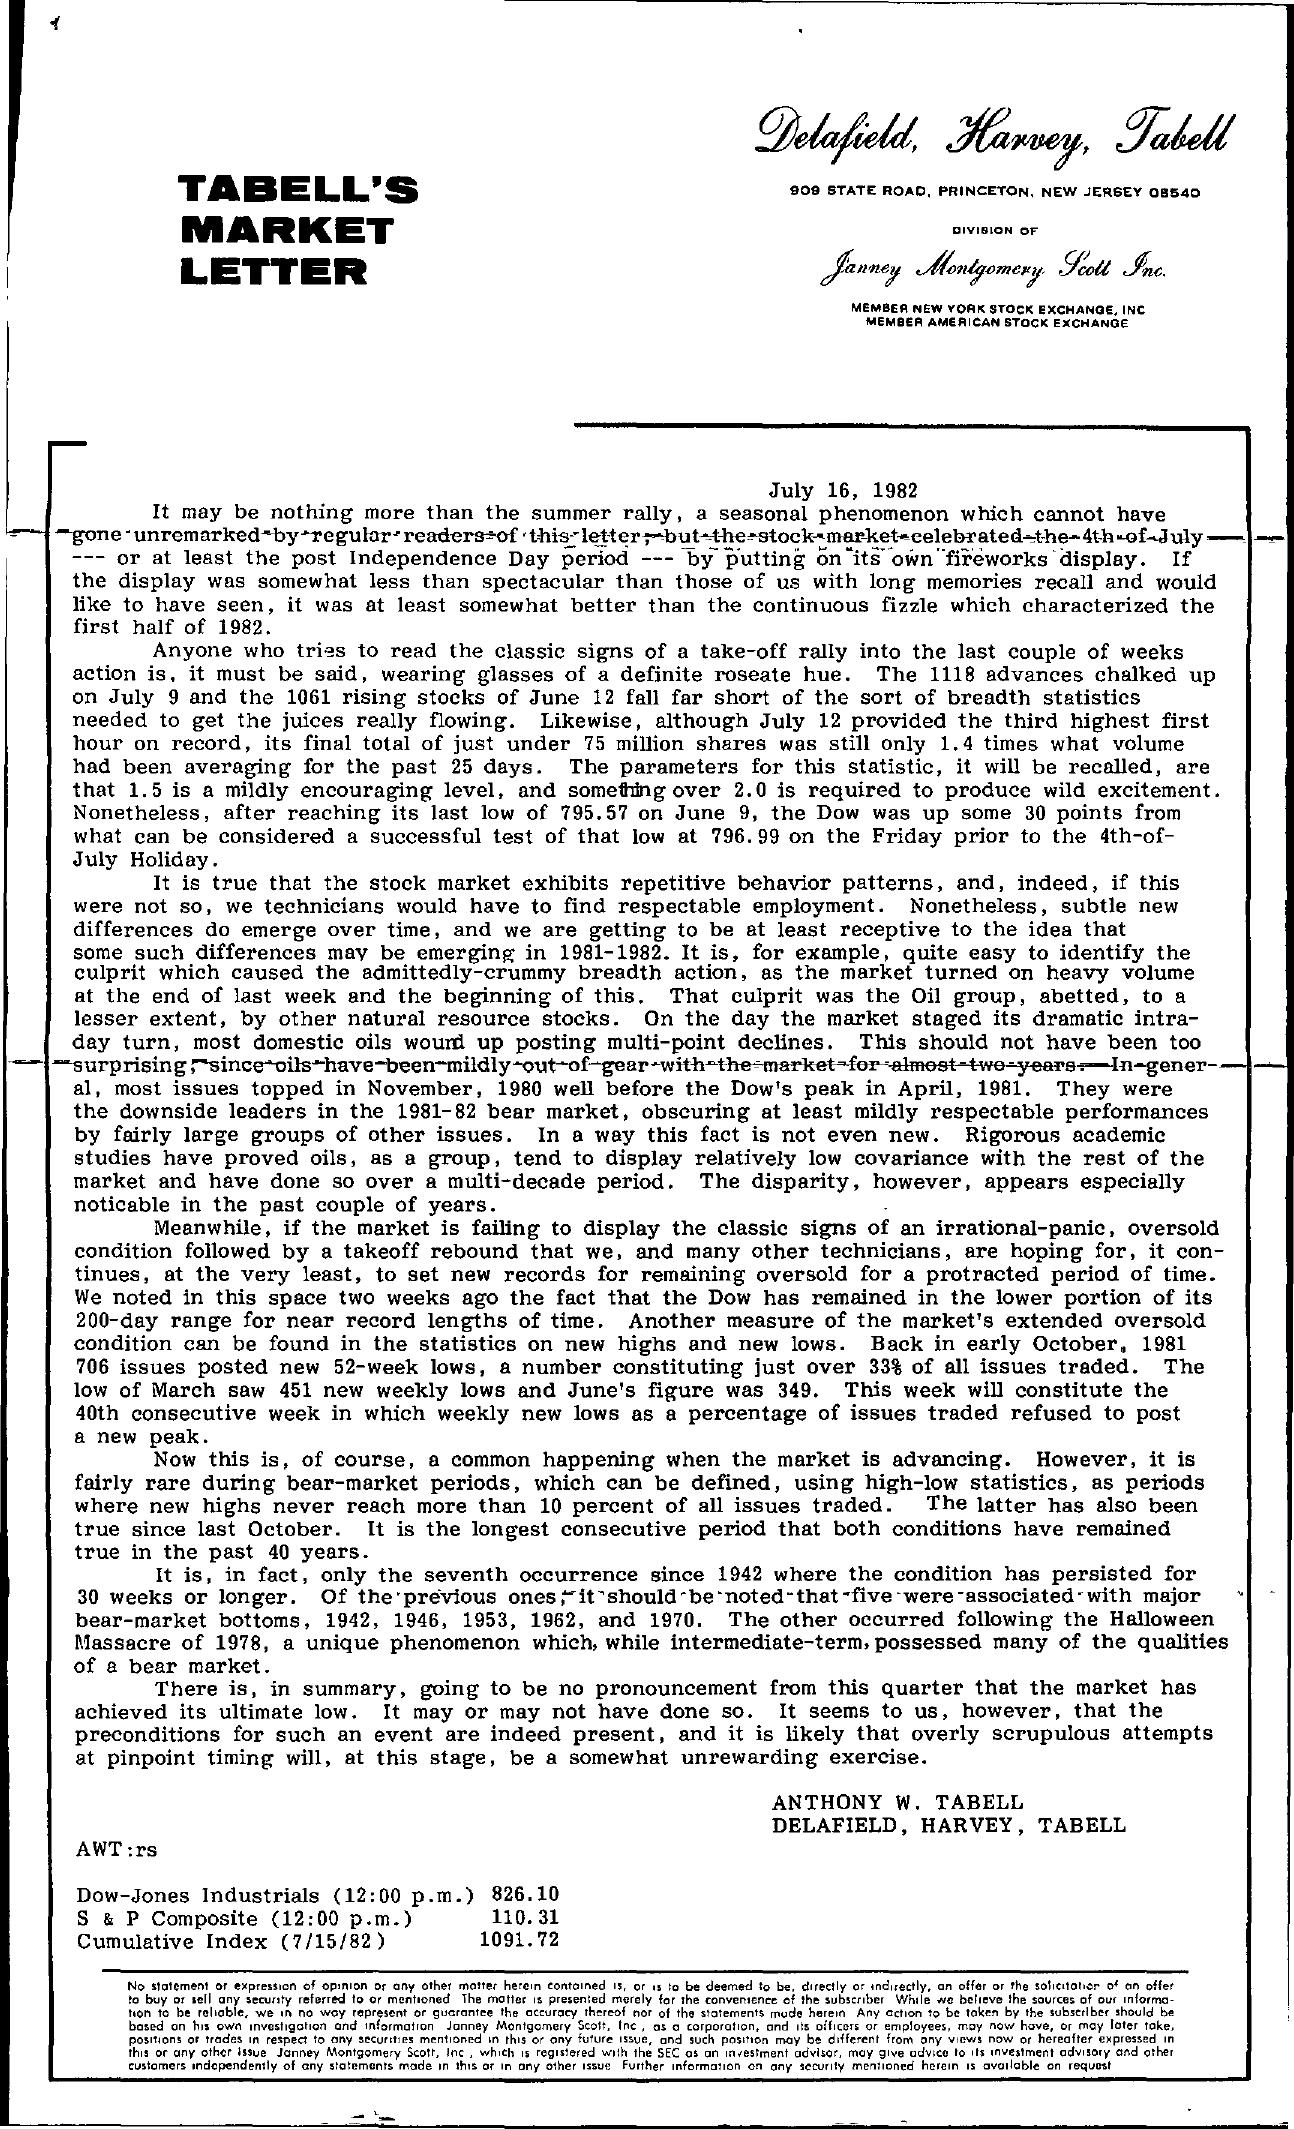 Tabell's Market Letter - July 16, 1982